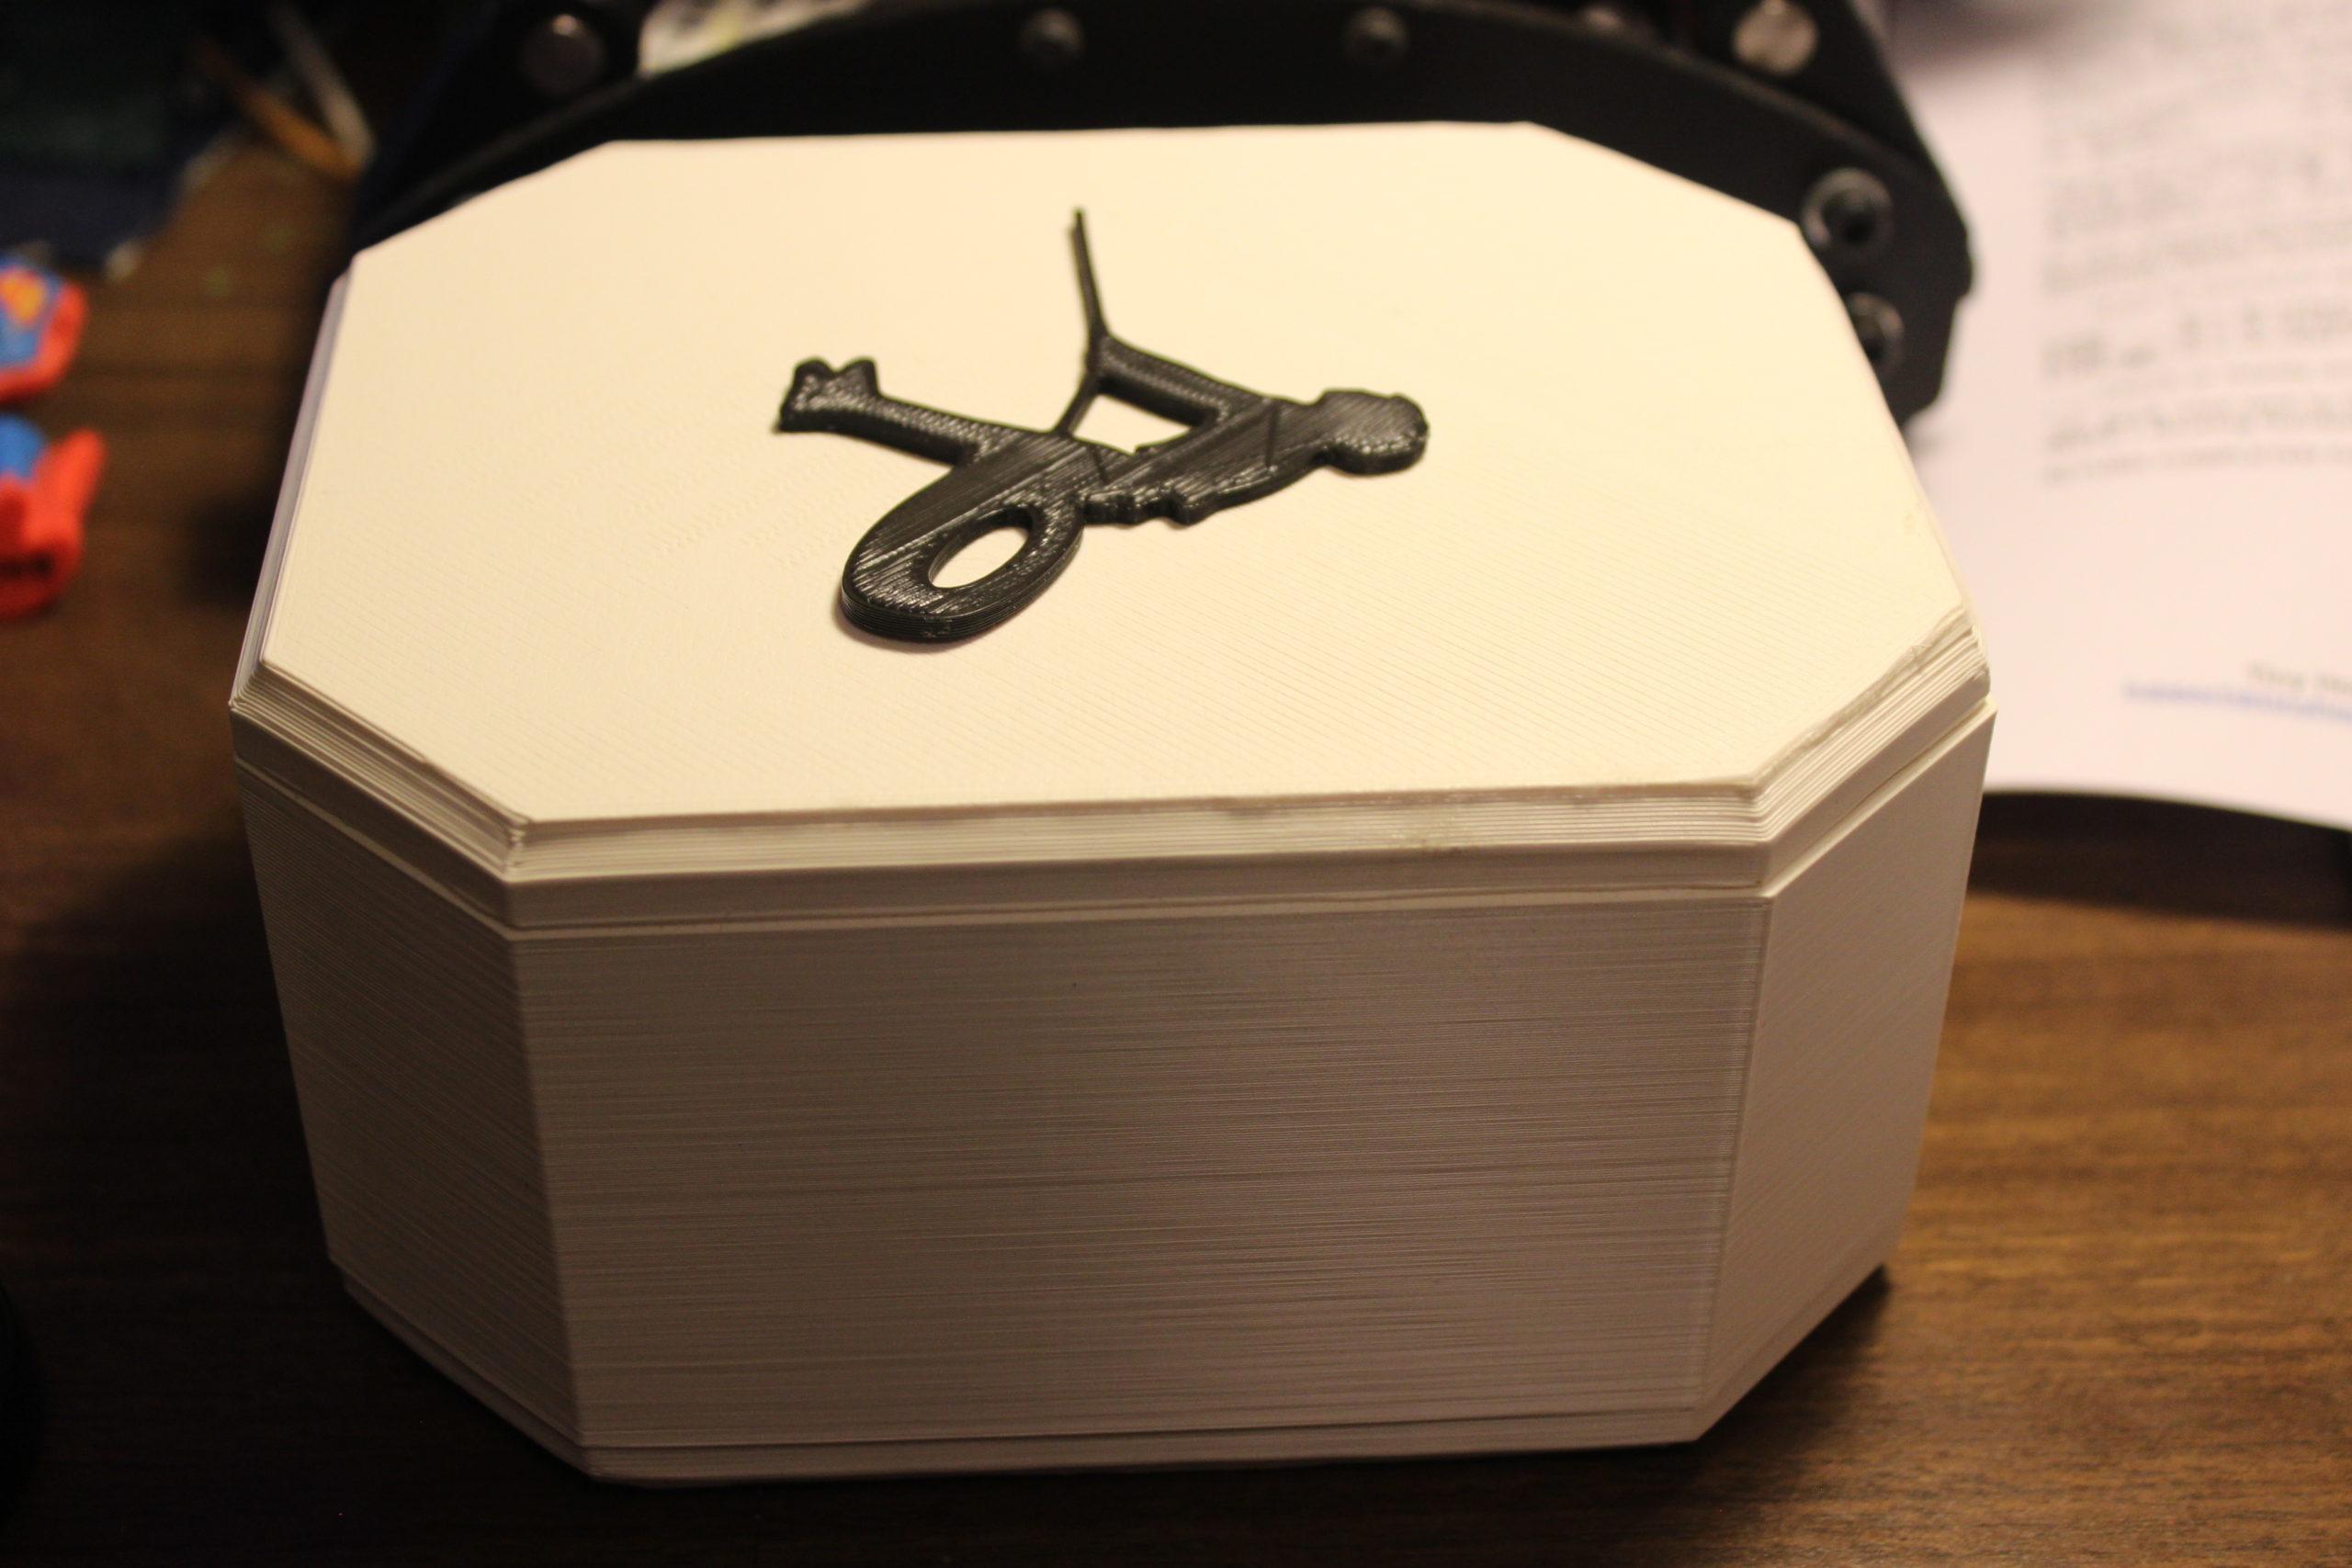 test urn